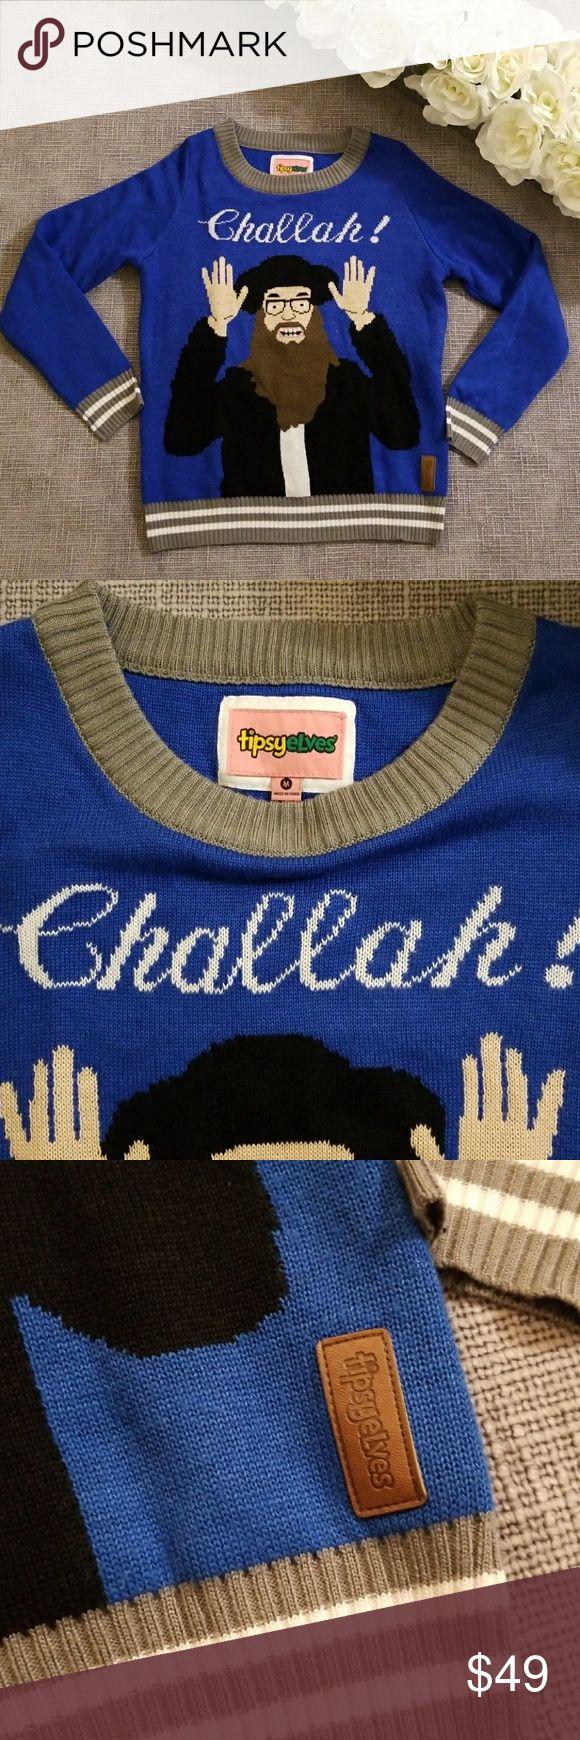 Holiday Hanukkah ugly sweater Holiday Hanukah ugly sweater Size M 19.5 inches underarm to underarm  24 inches shoulder to bottom tipsyelves Sweaters Crew & Scoop Necks